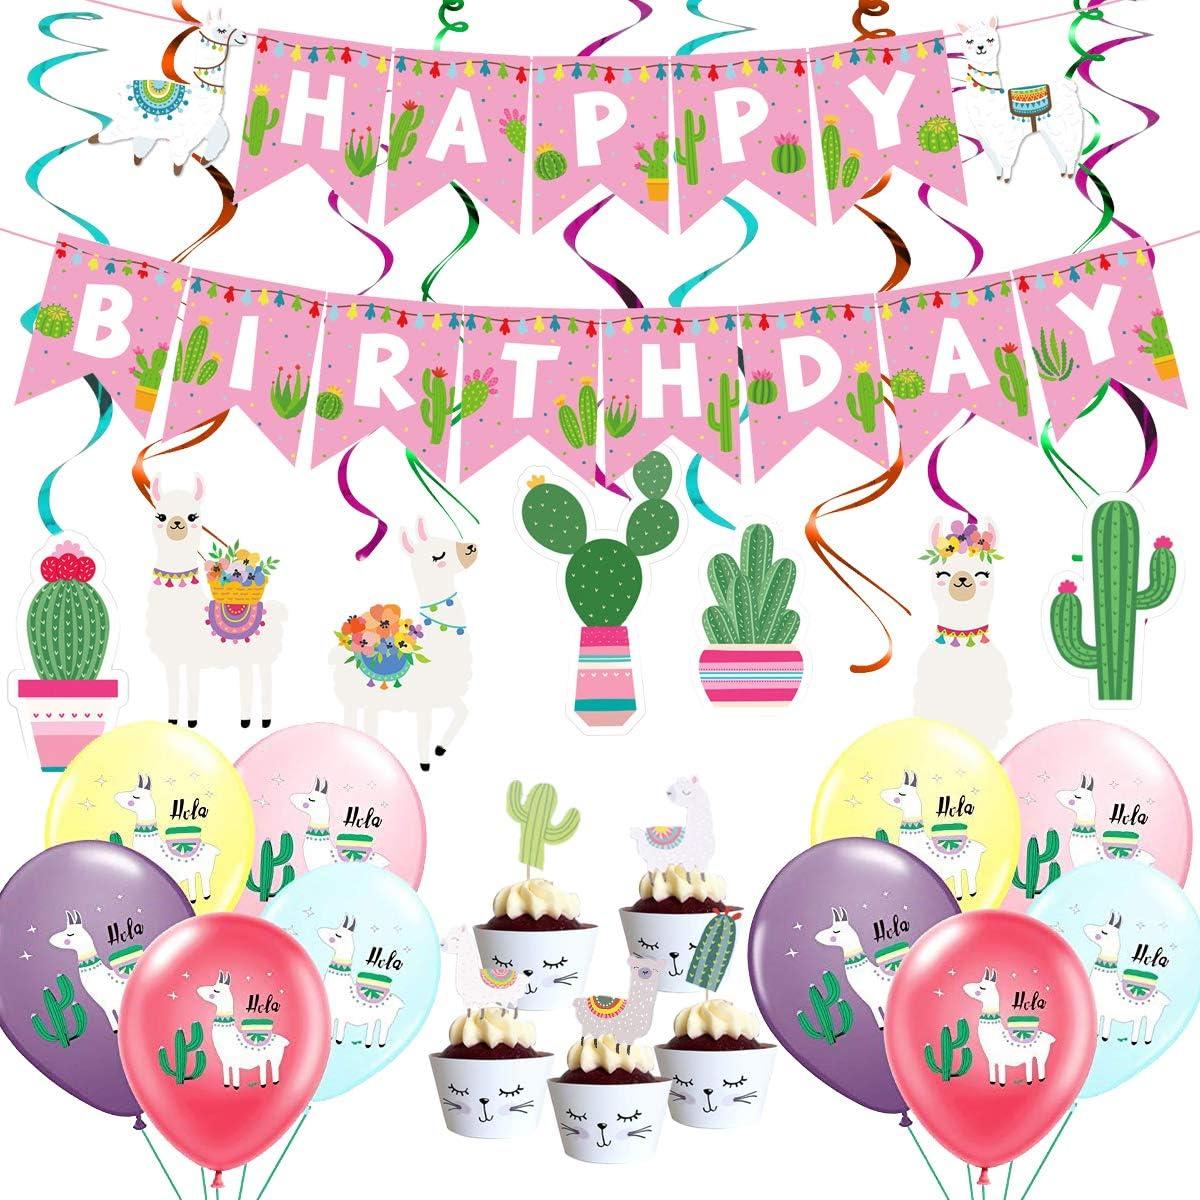 Cactus Party Decor Cute Llama Cut Files Llama Cake Topper svg Birthday Cake Topper Set Svg Cupcake Toppers Svg Llama Cactus Svg